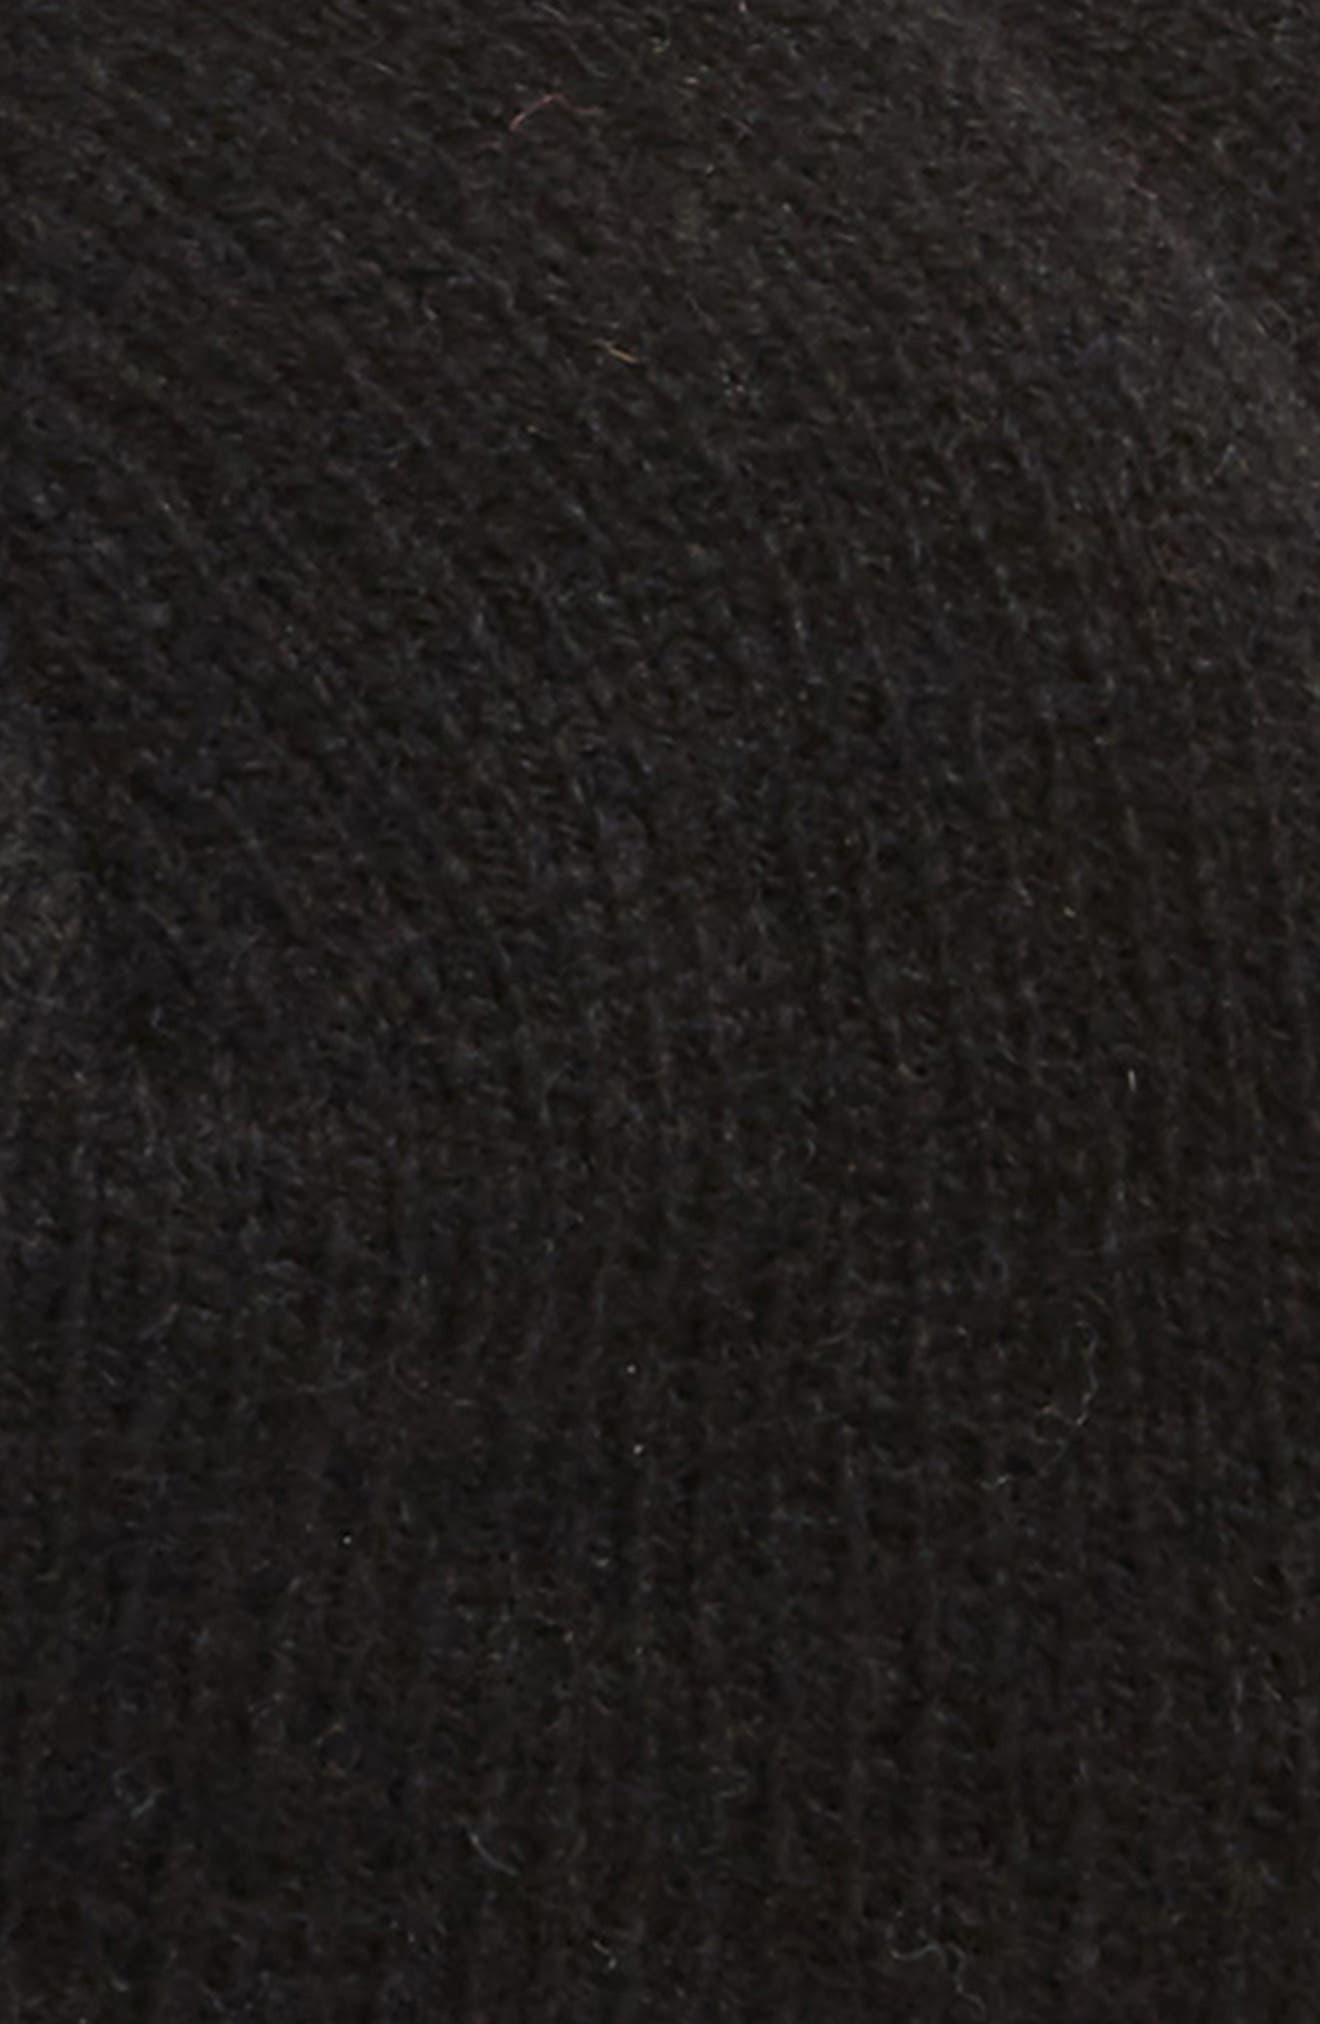 Brodeo Wool Stocking Cap,                             Alternate thumbnail 2, color,                             001